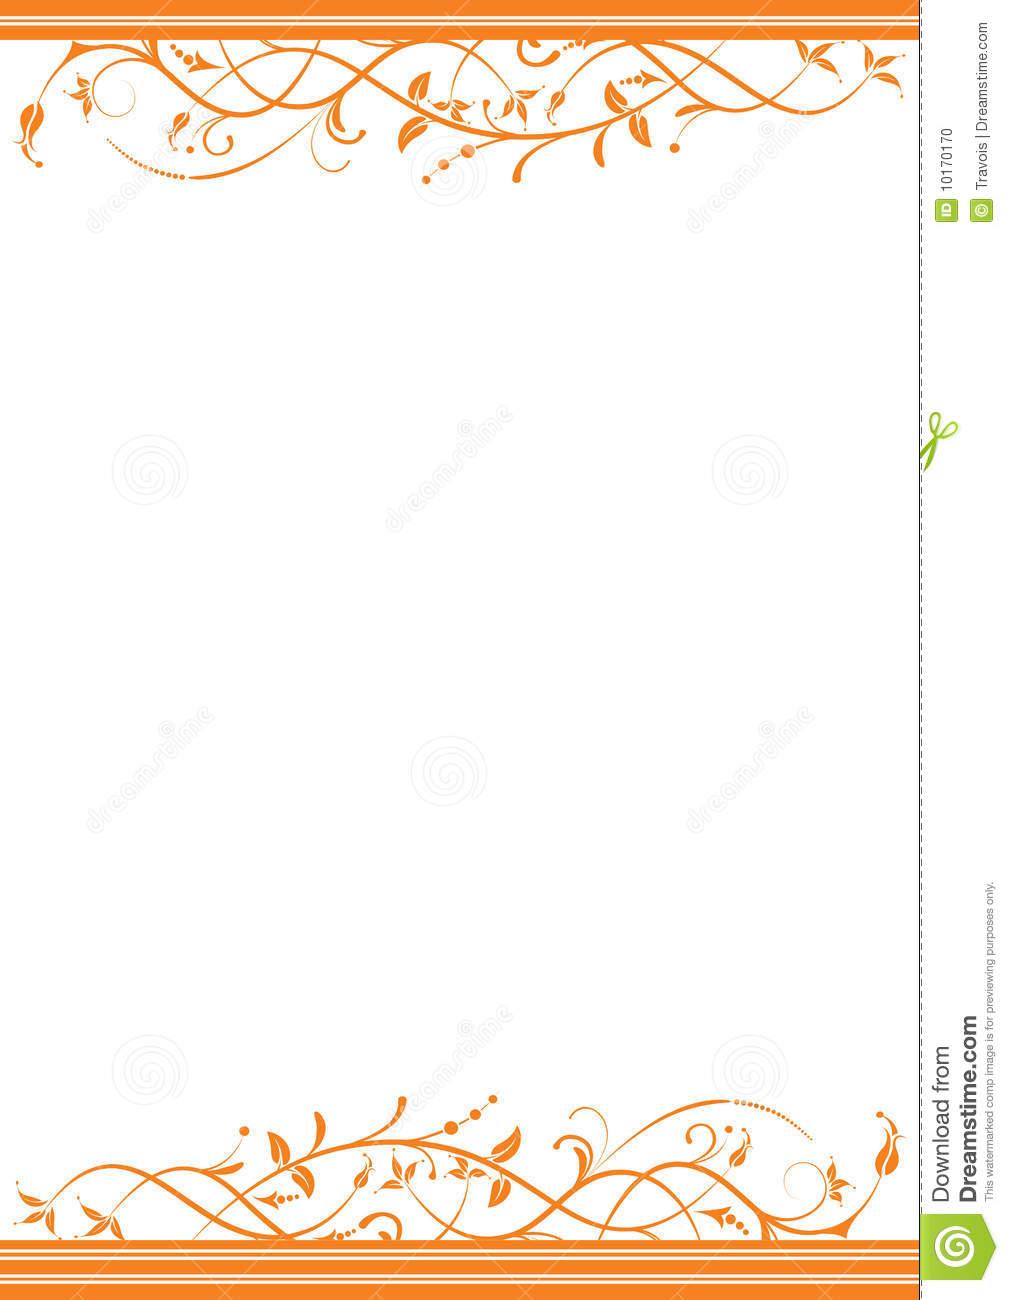 Orange Border Cliparts on Scalloped Page Border